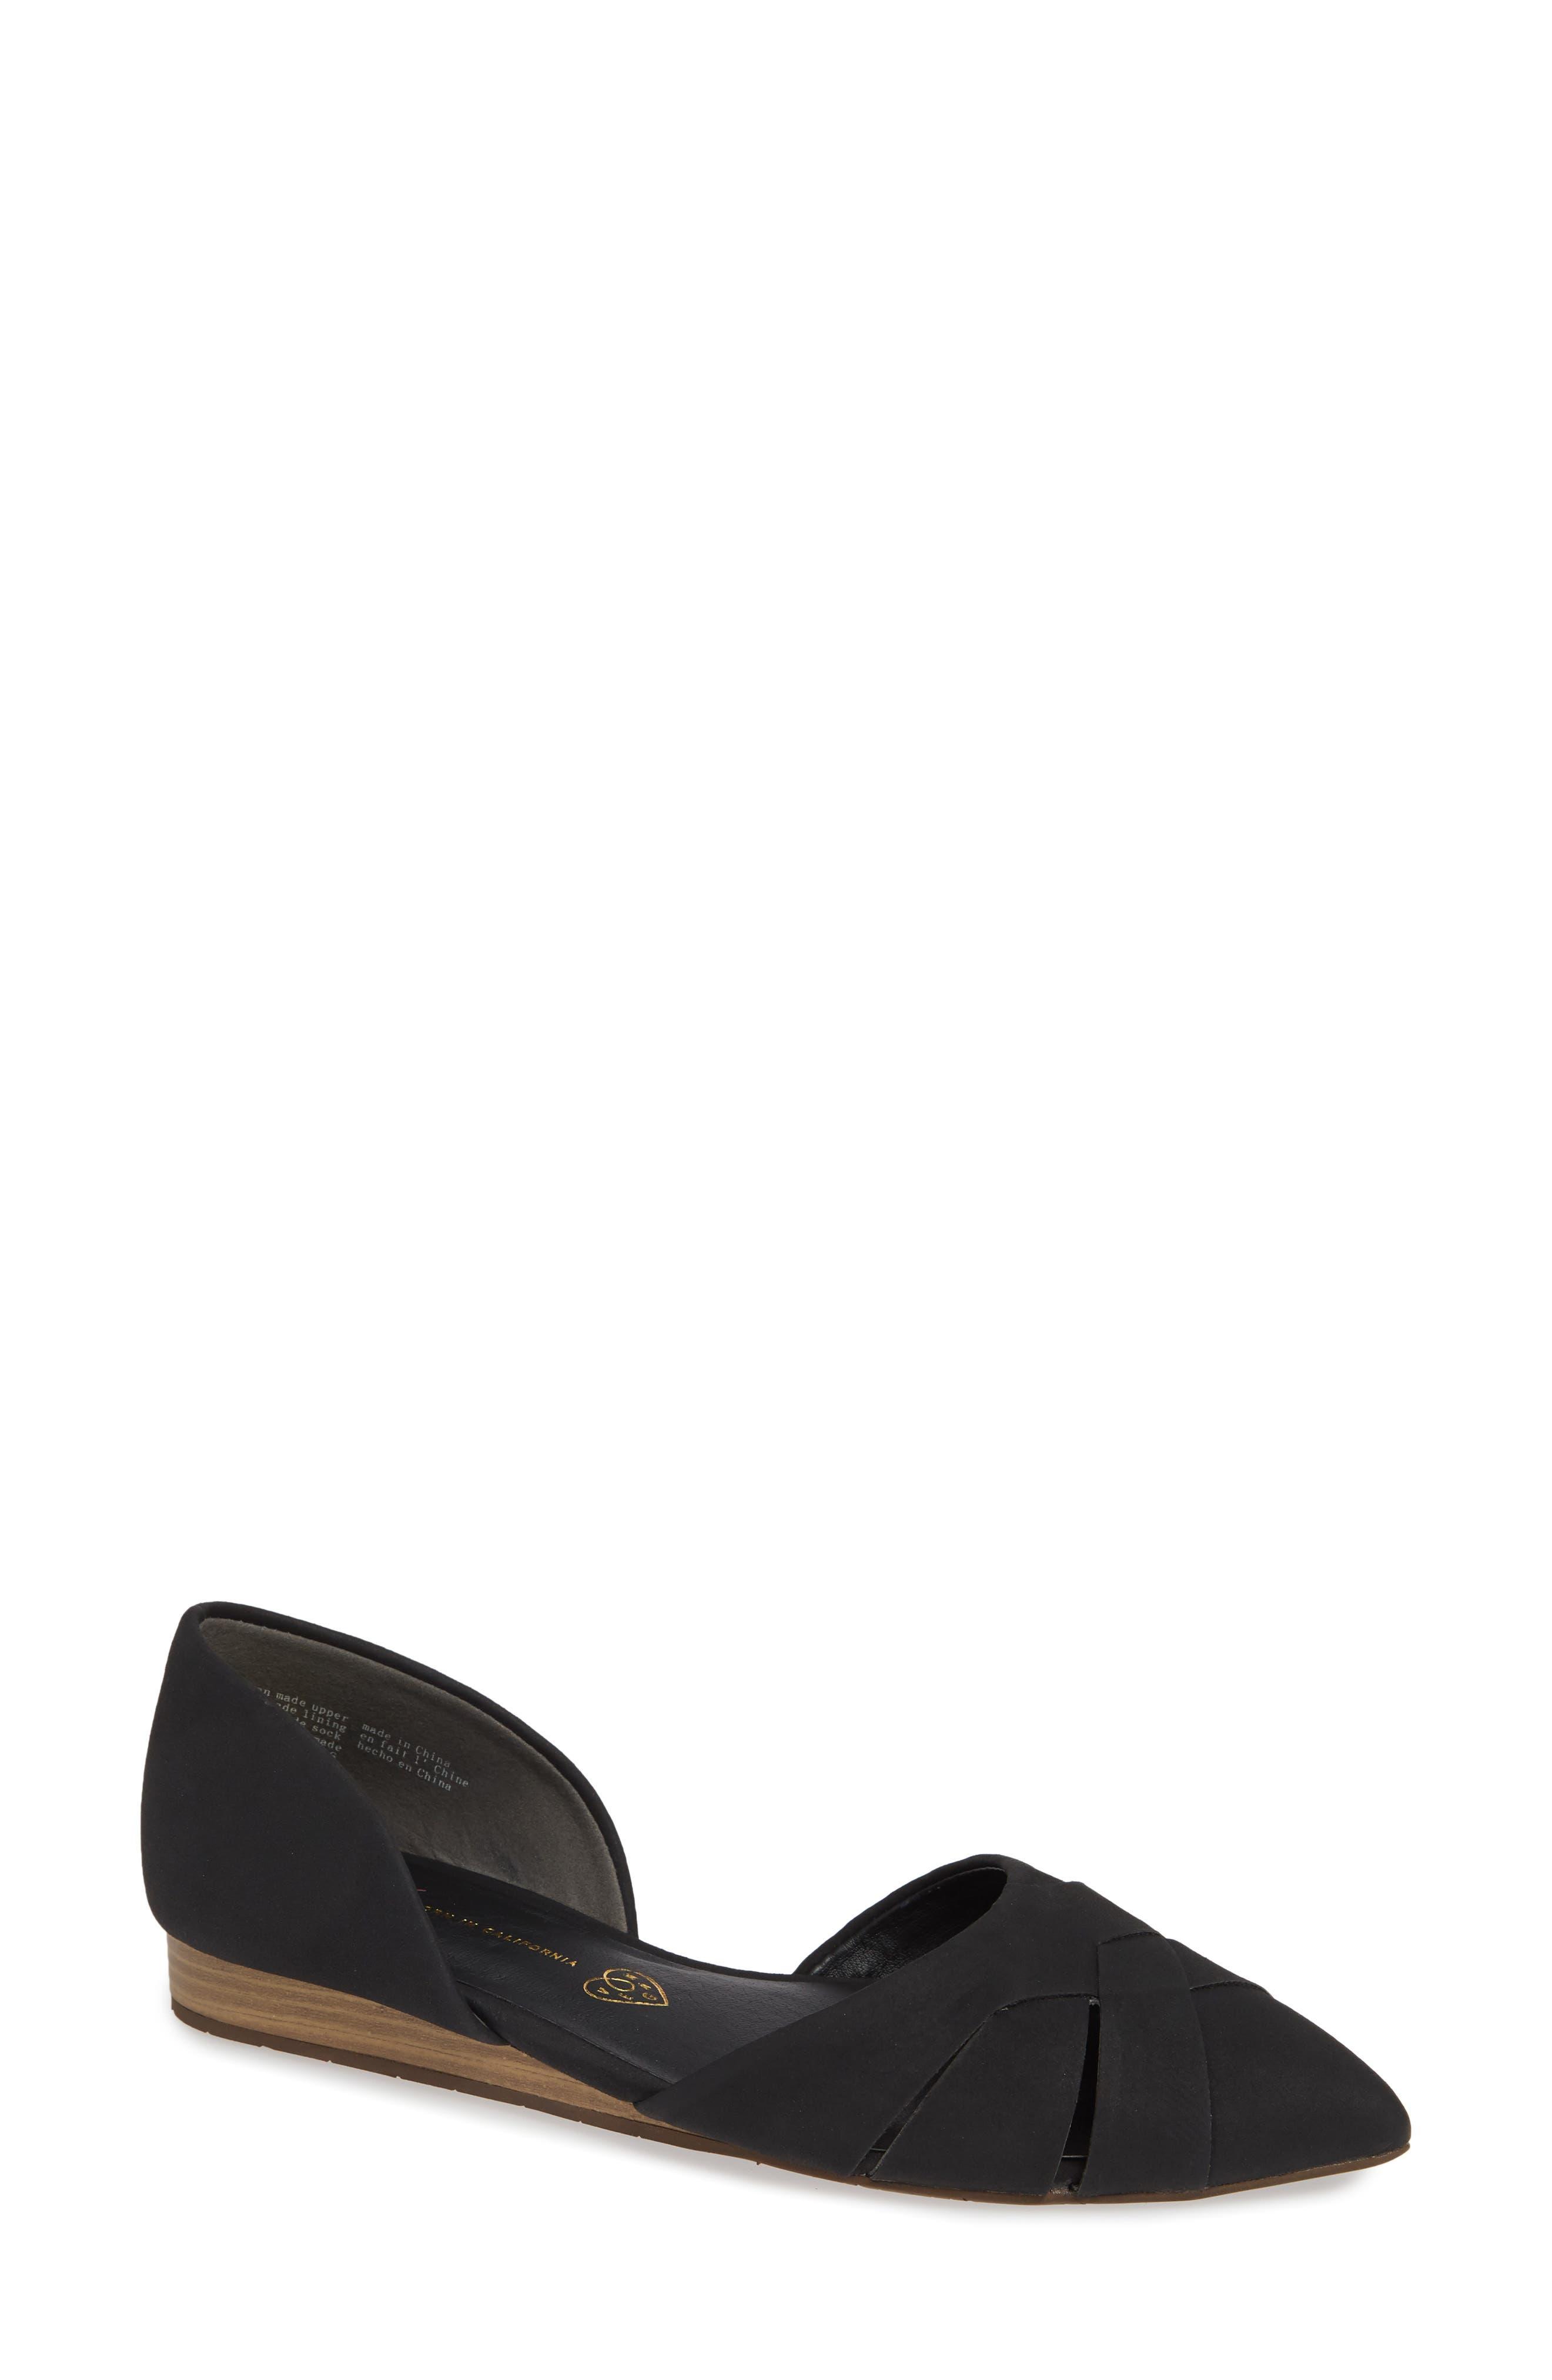 Bc Footwear Focal Point Vegan Pointy Toe Flat, Black